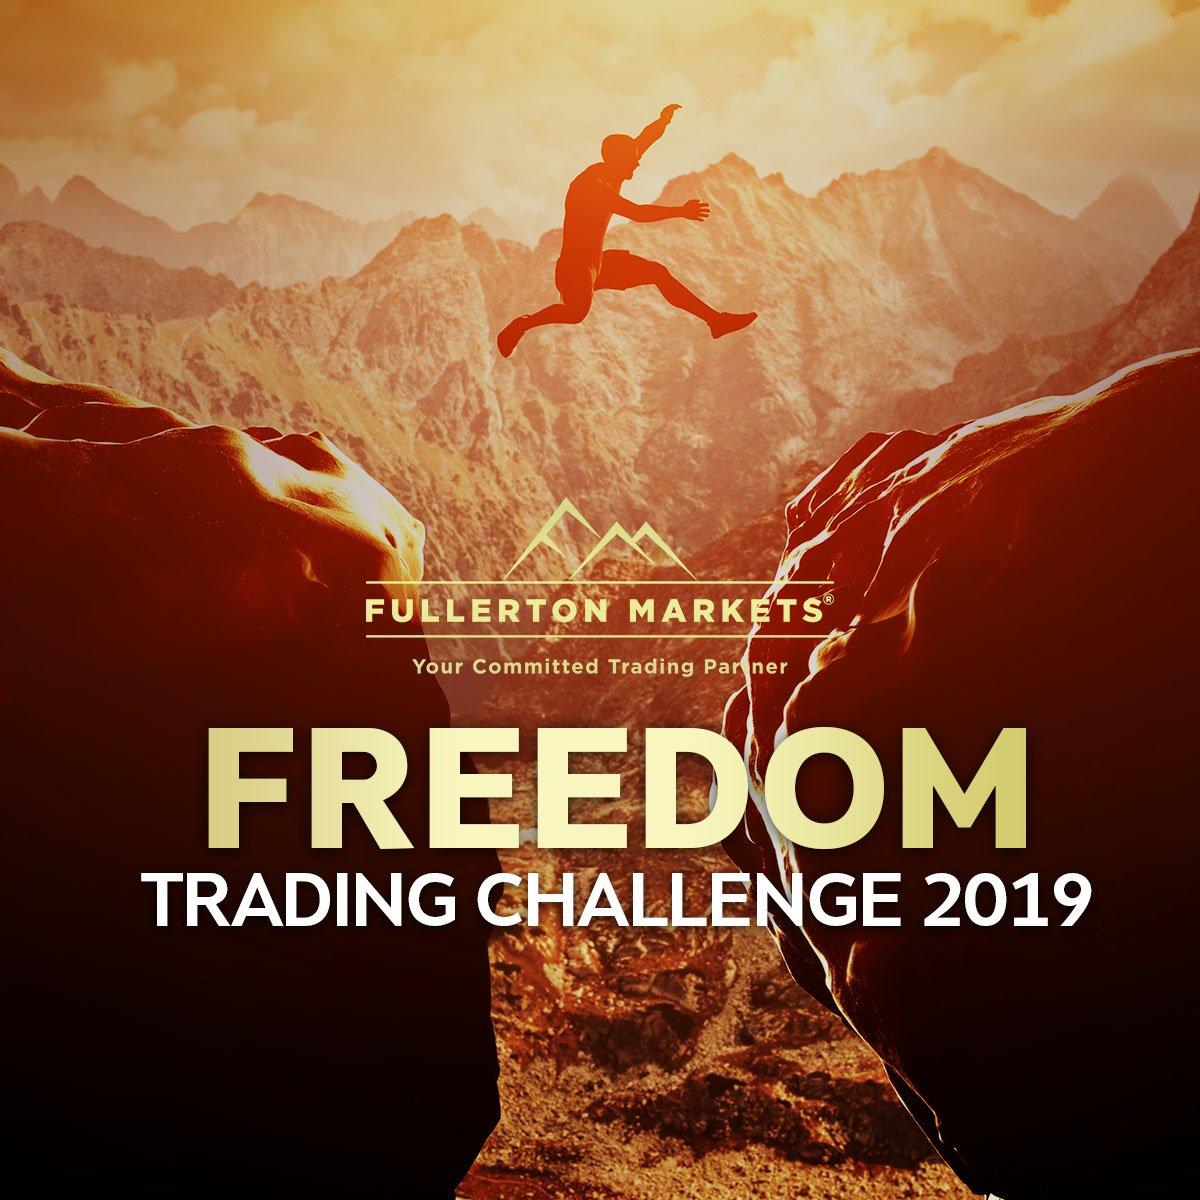 1200x1200_freedom-trading-challenge